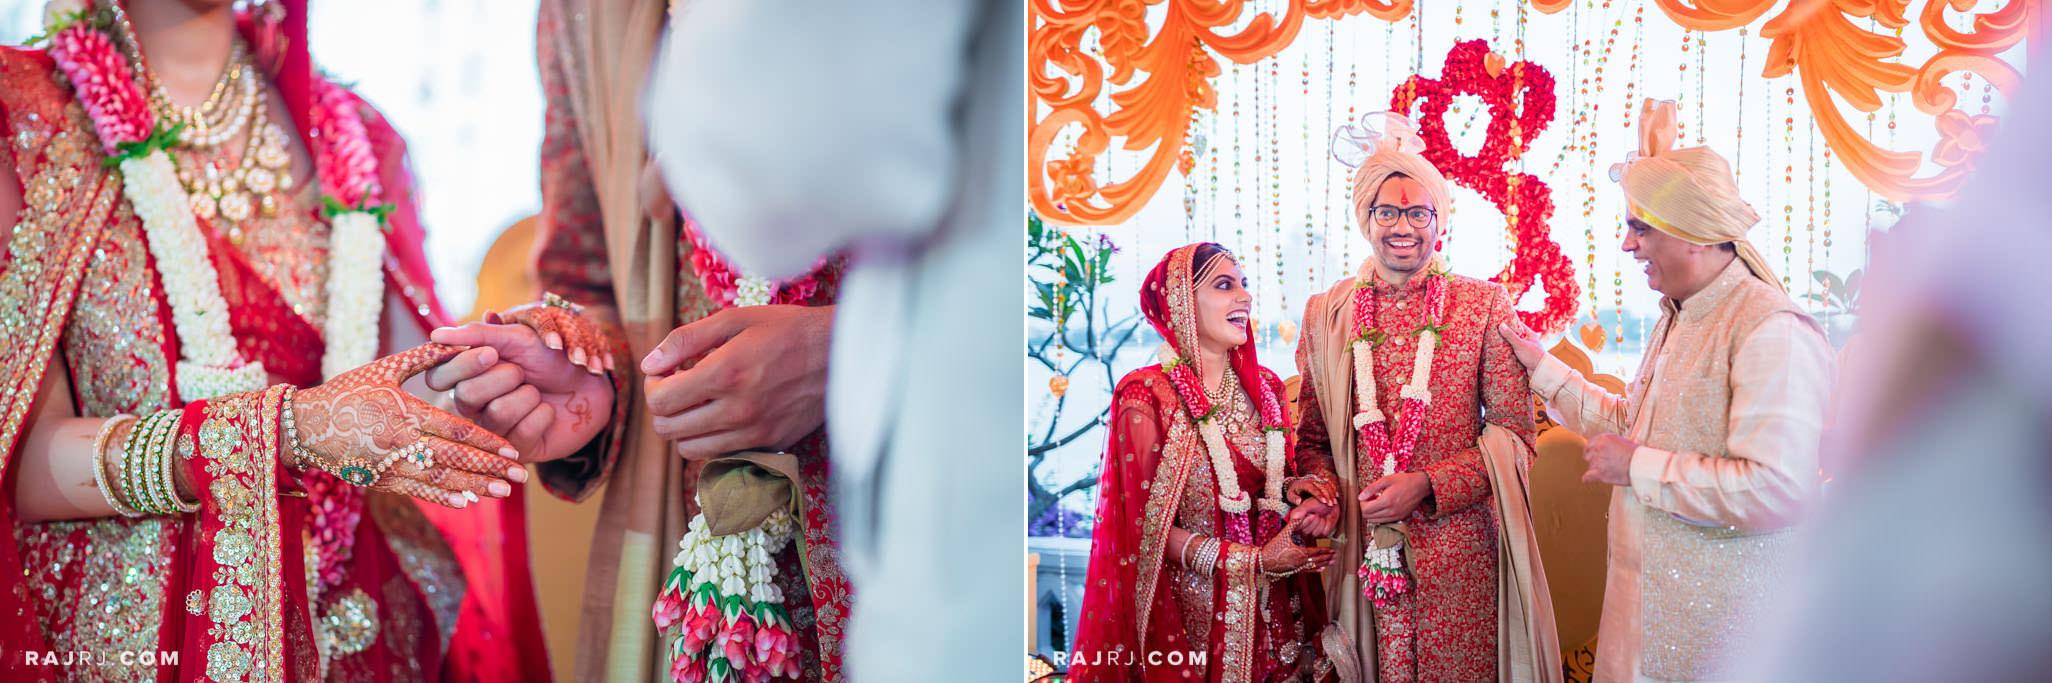 RAJ_THAILAND_WEDDING_PHOTOGRAPHY-80_1.jpg